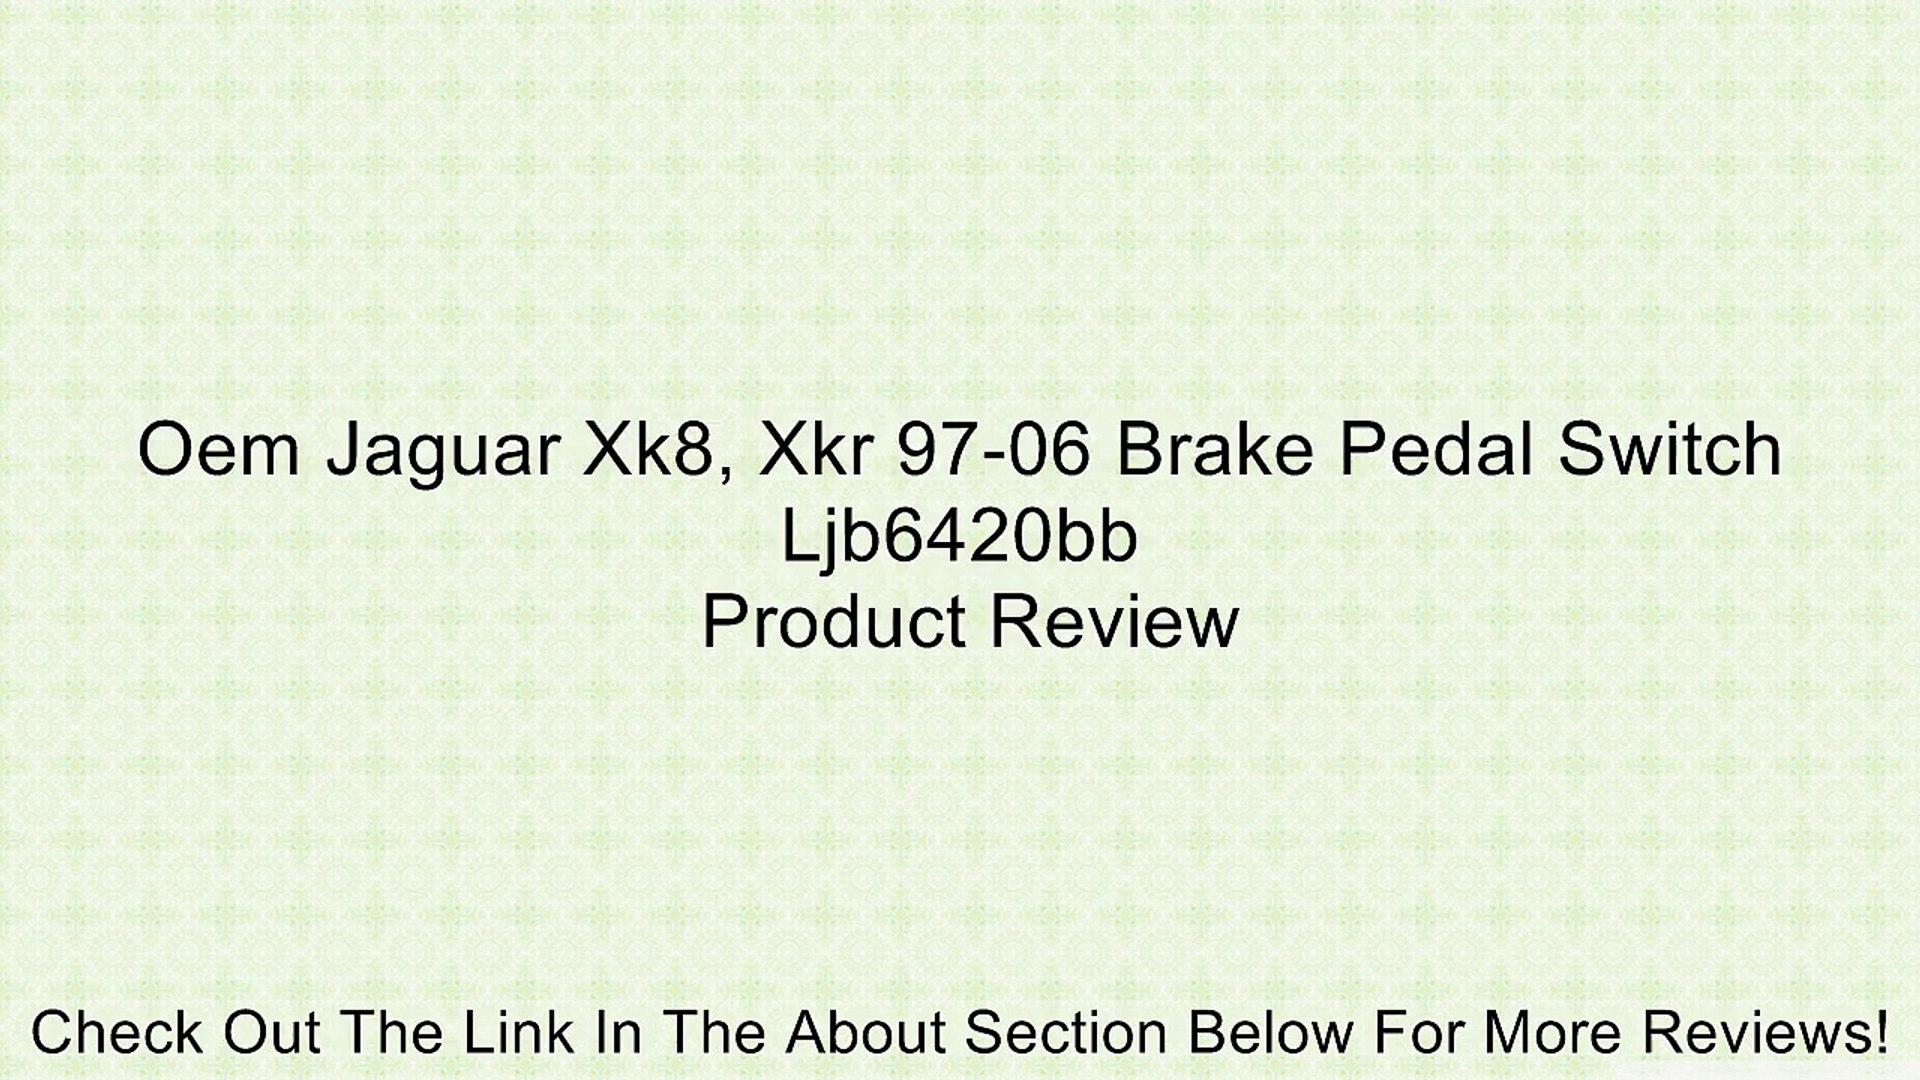 Oem Jaguar Xk8, Xkr 97-06 Brake Pedal Switch Ljb6420bb Review